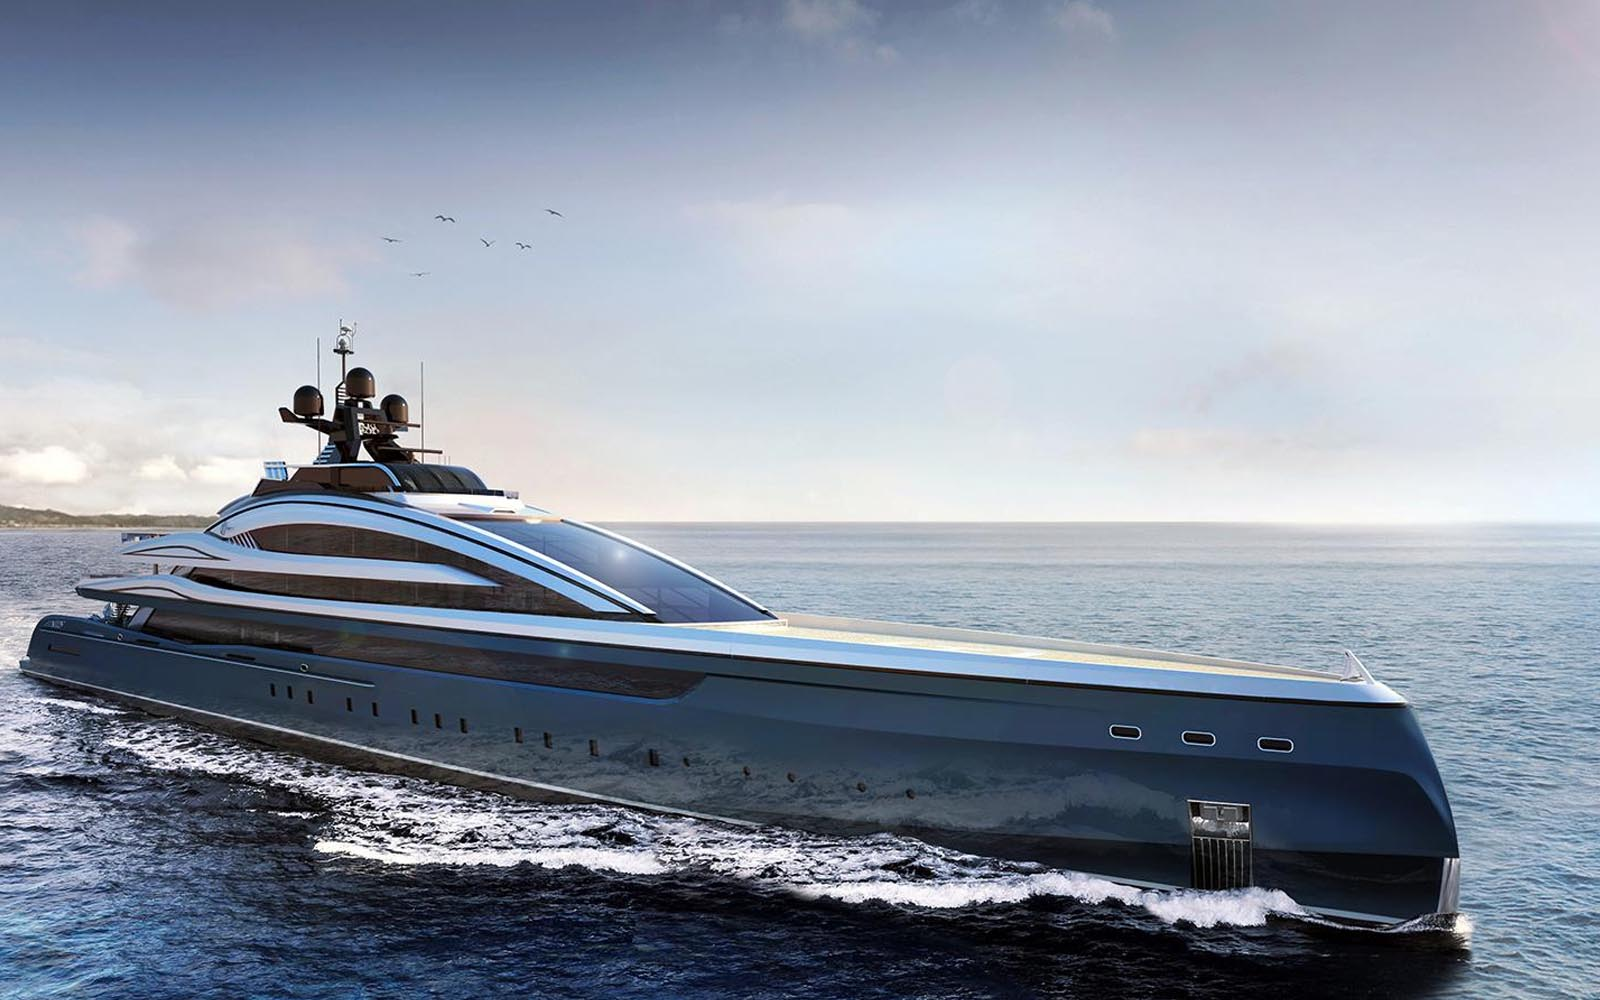 Hydro Tec revela novos detalhes e renders do conceito Crossbow-boatshopping